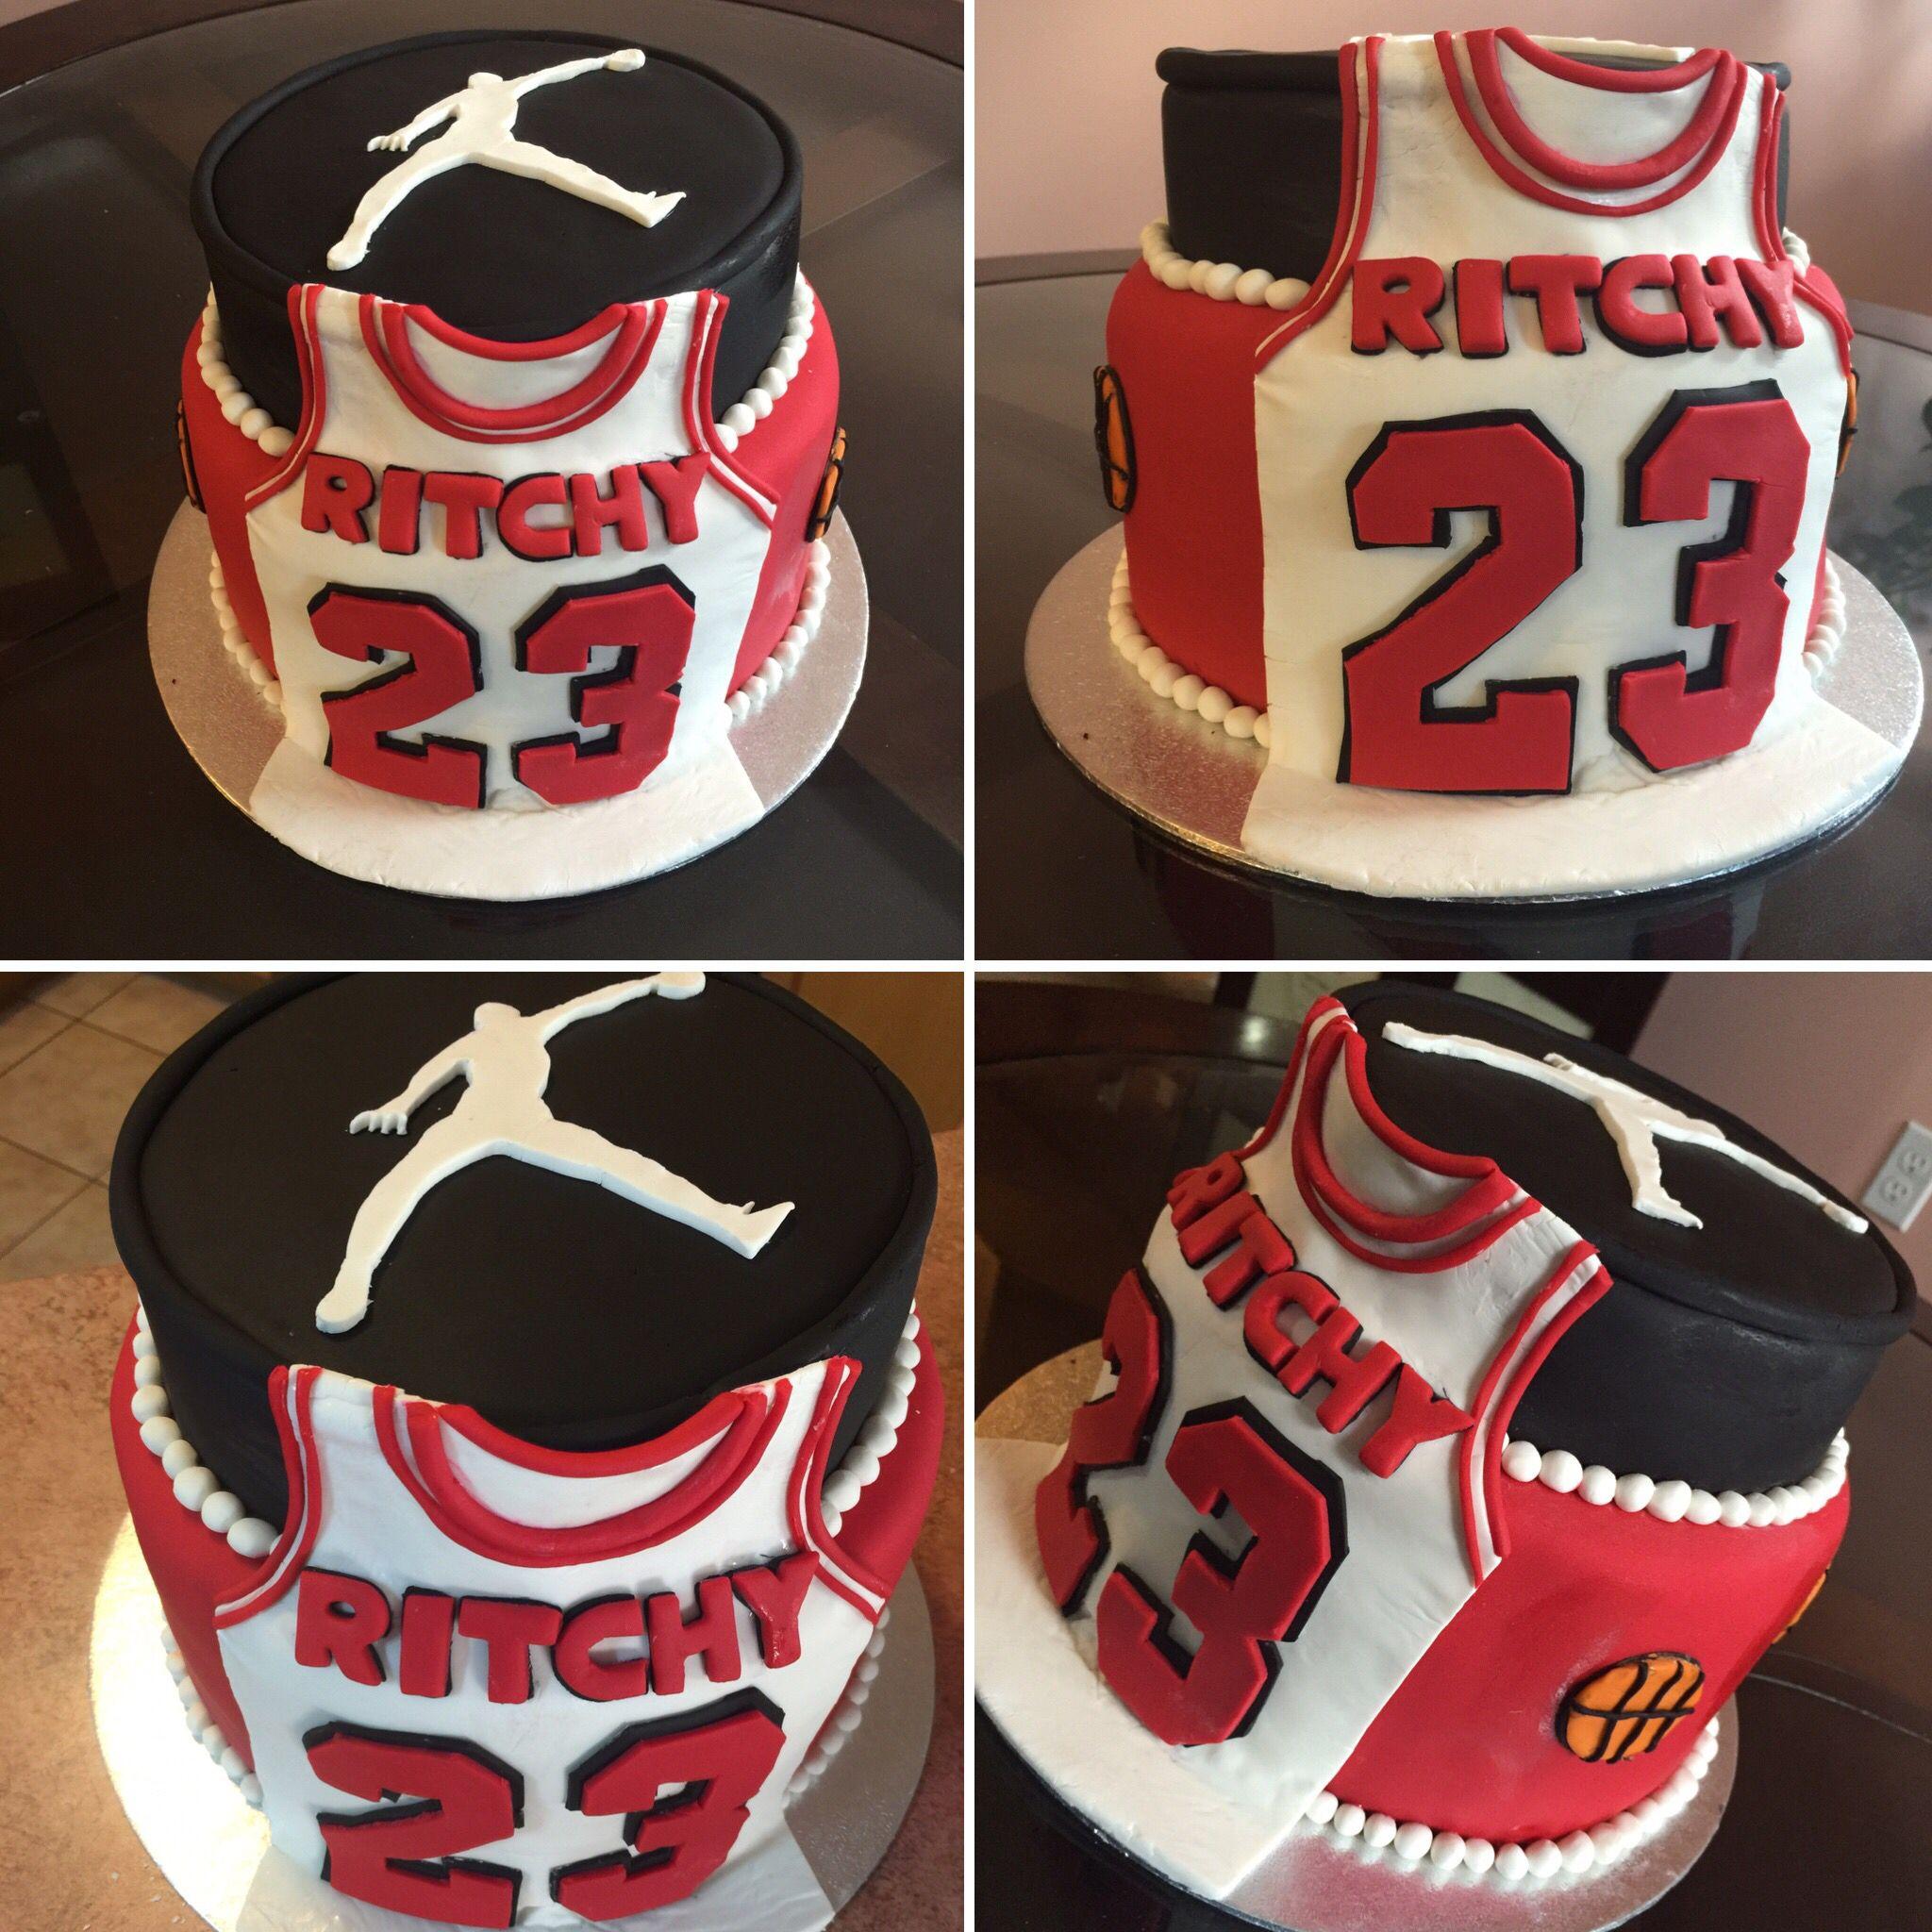 Michael Jordan Cake Cake Designs By Me Sugary Tales